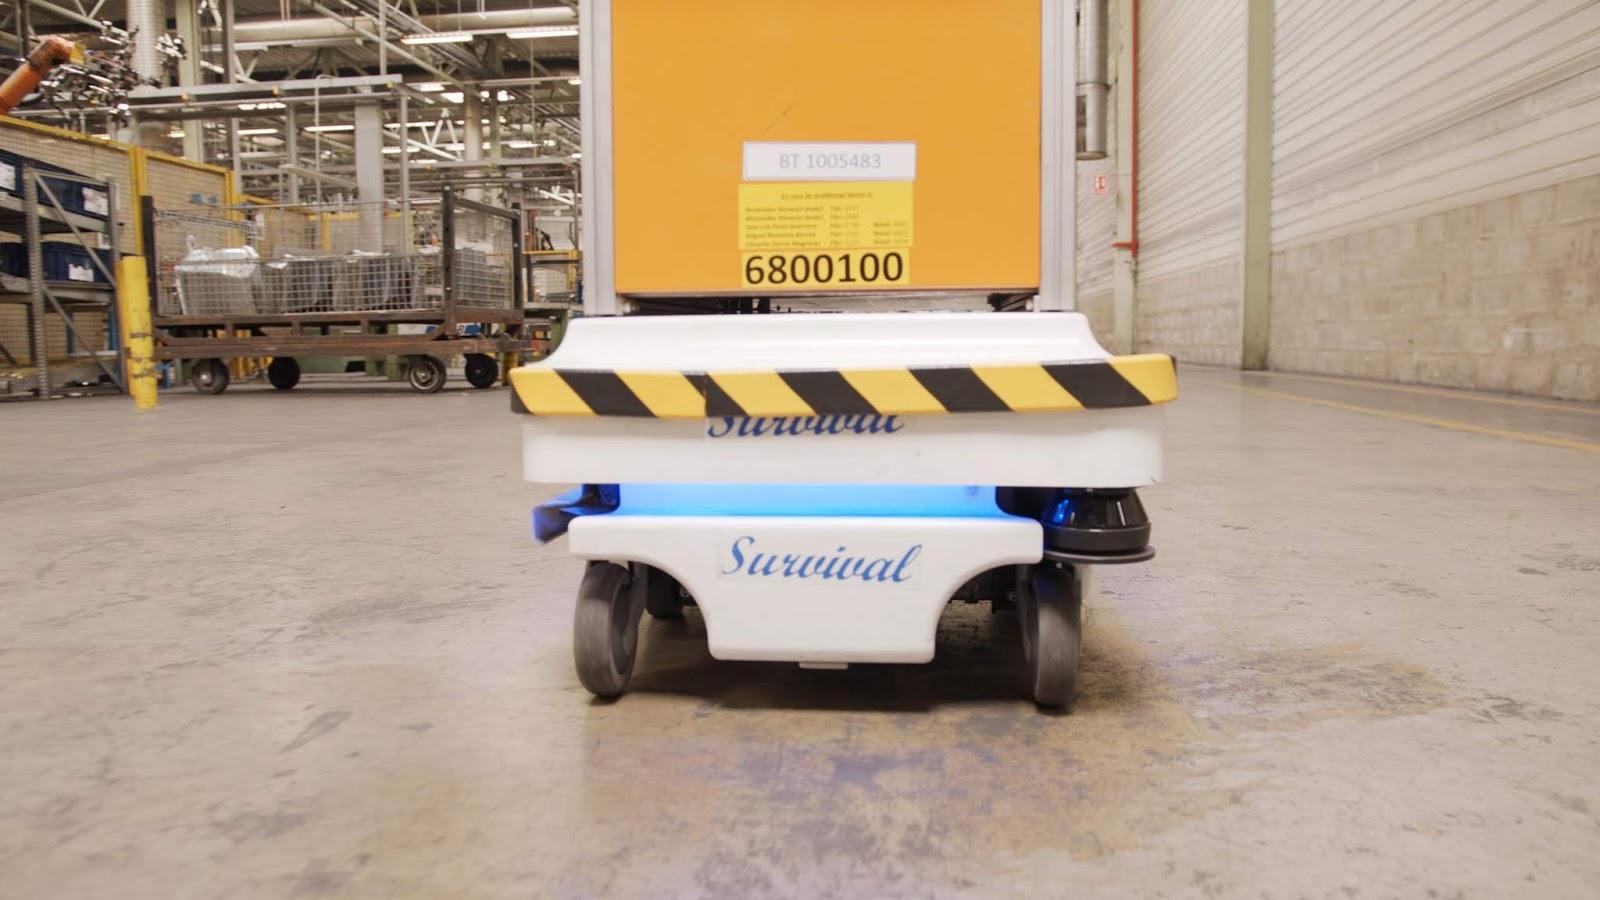 Ford SelfDrivingRobot 3 Η Ford έφτιαξε ένα ρομπότ για τις χαμαλοδουλειές του εργοστασίου της! Ford, video, videos, Εργοστάσιο, Τεχνολογία